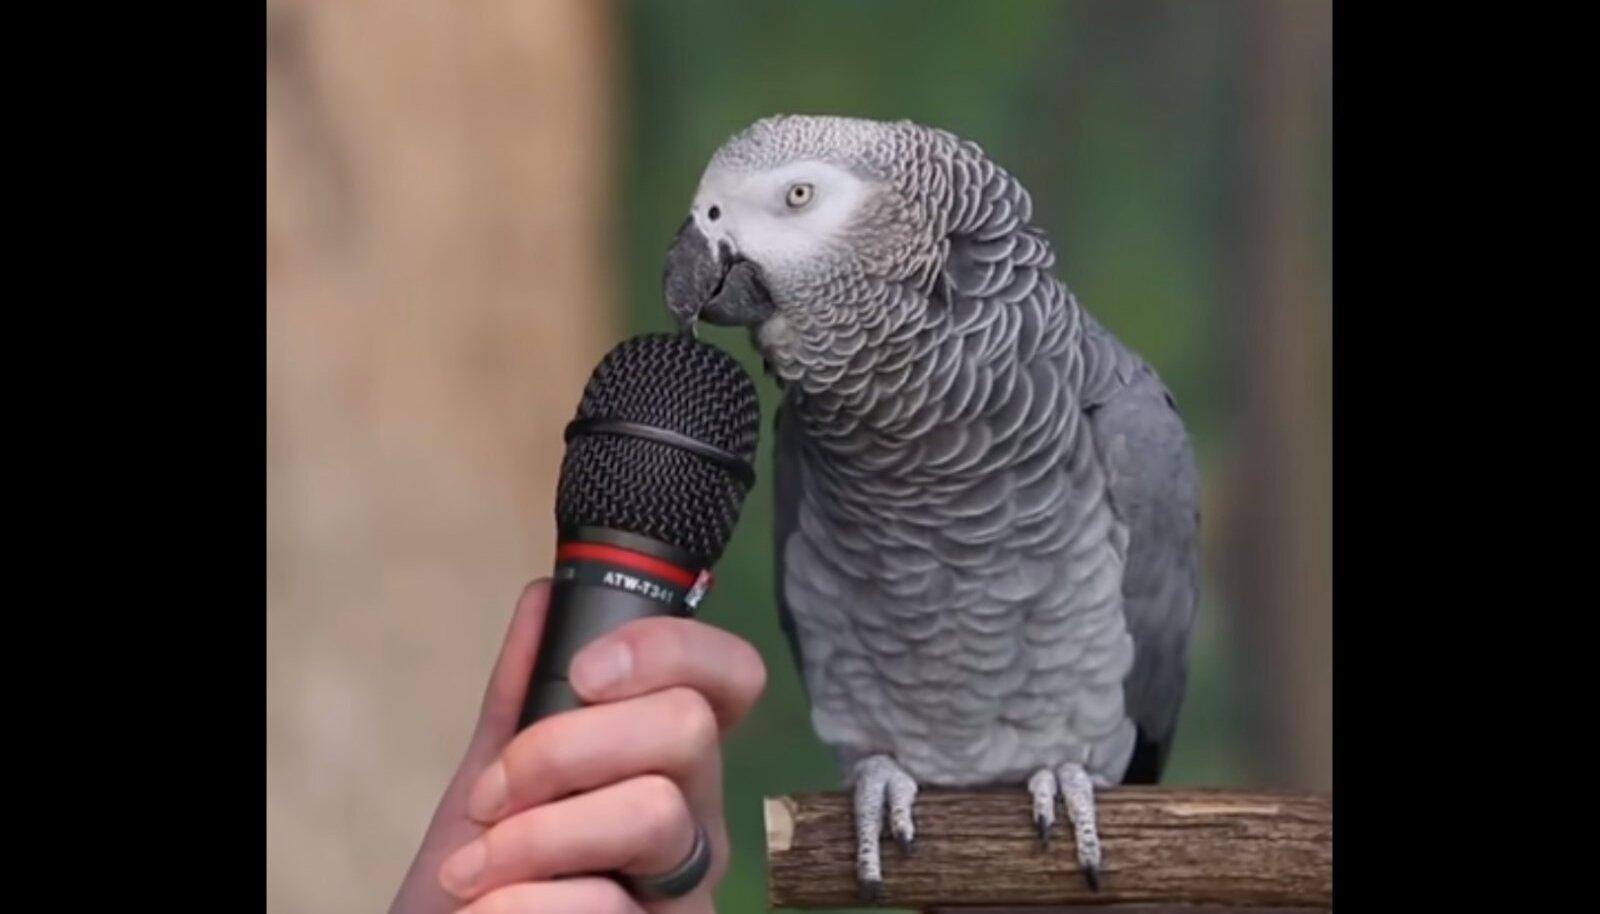 Papagoi intervjuu